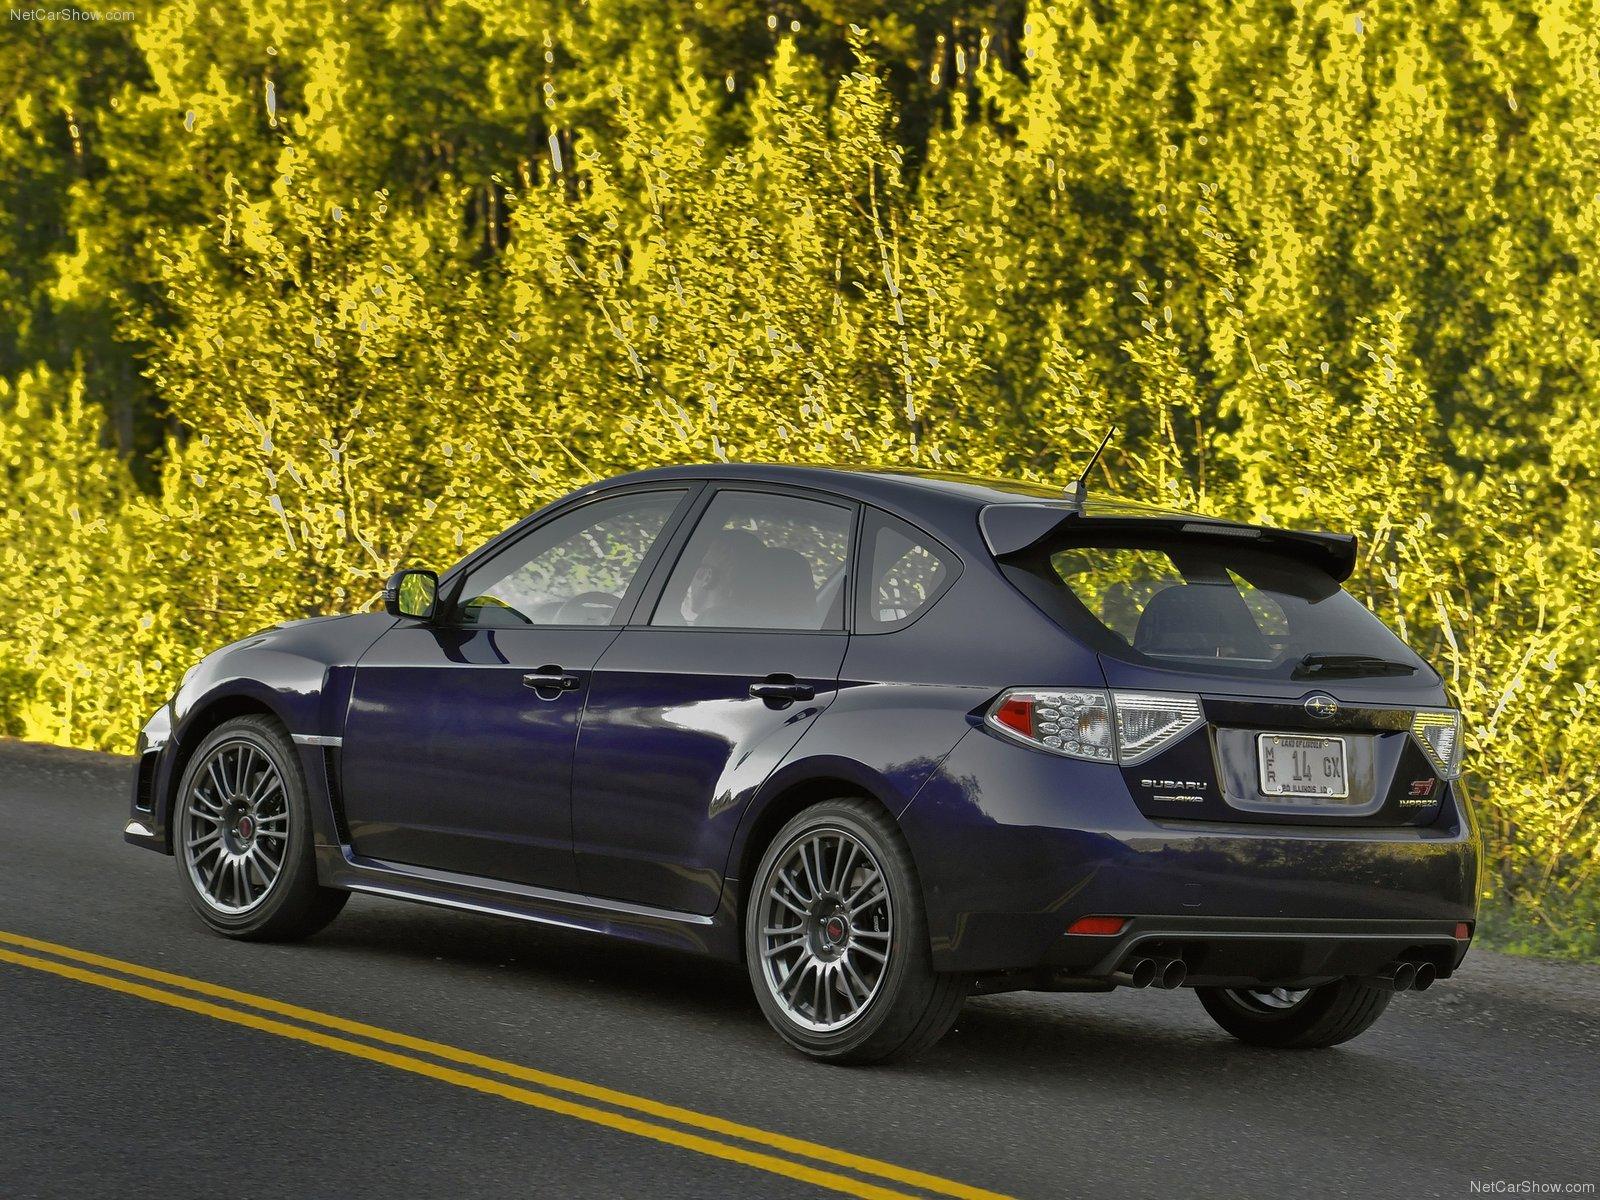 Subaru Impreza Wrx Sti 2011 Sport Cars